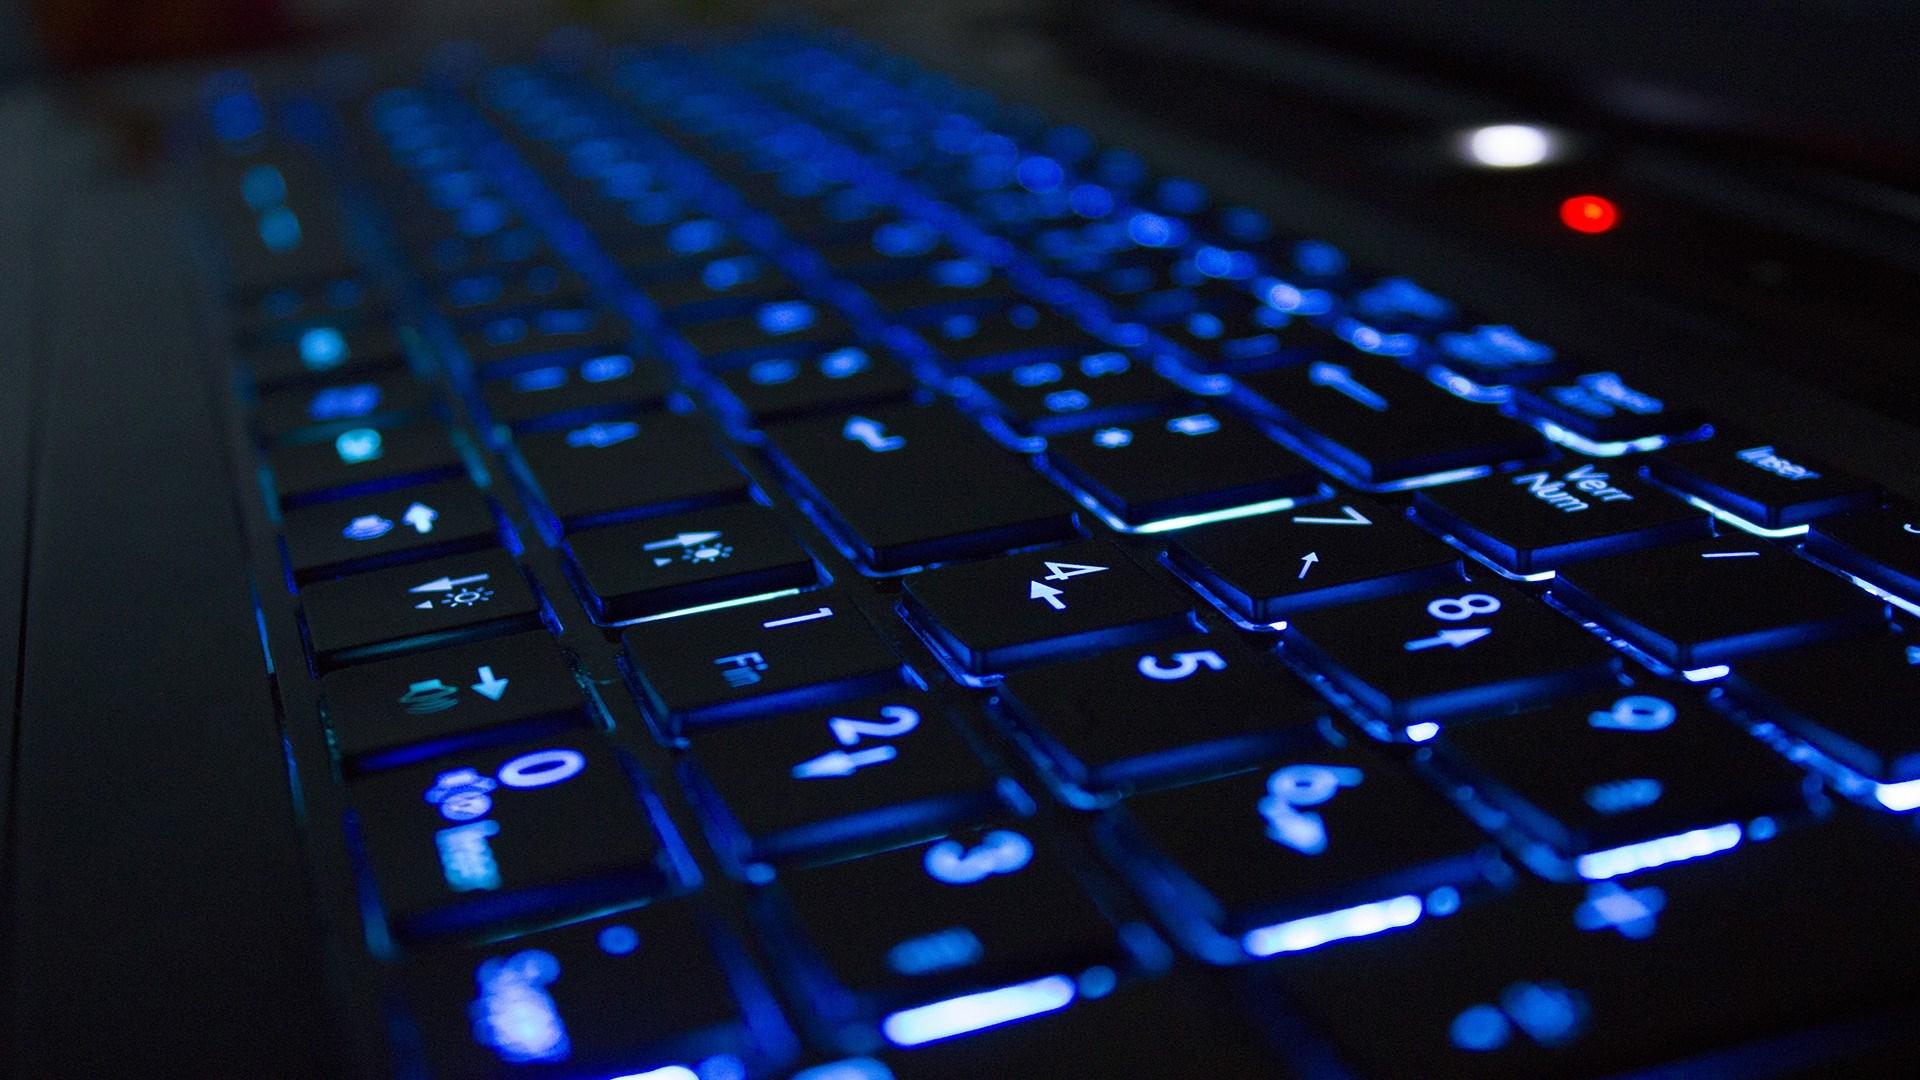 high tech keyboard 30880 1920x1080px